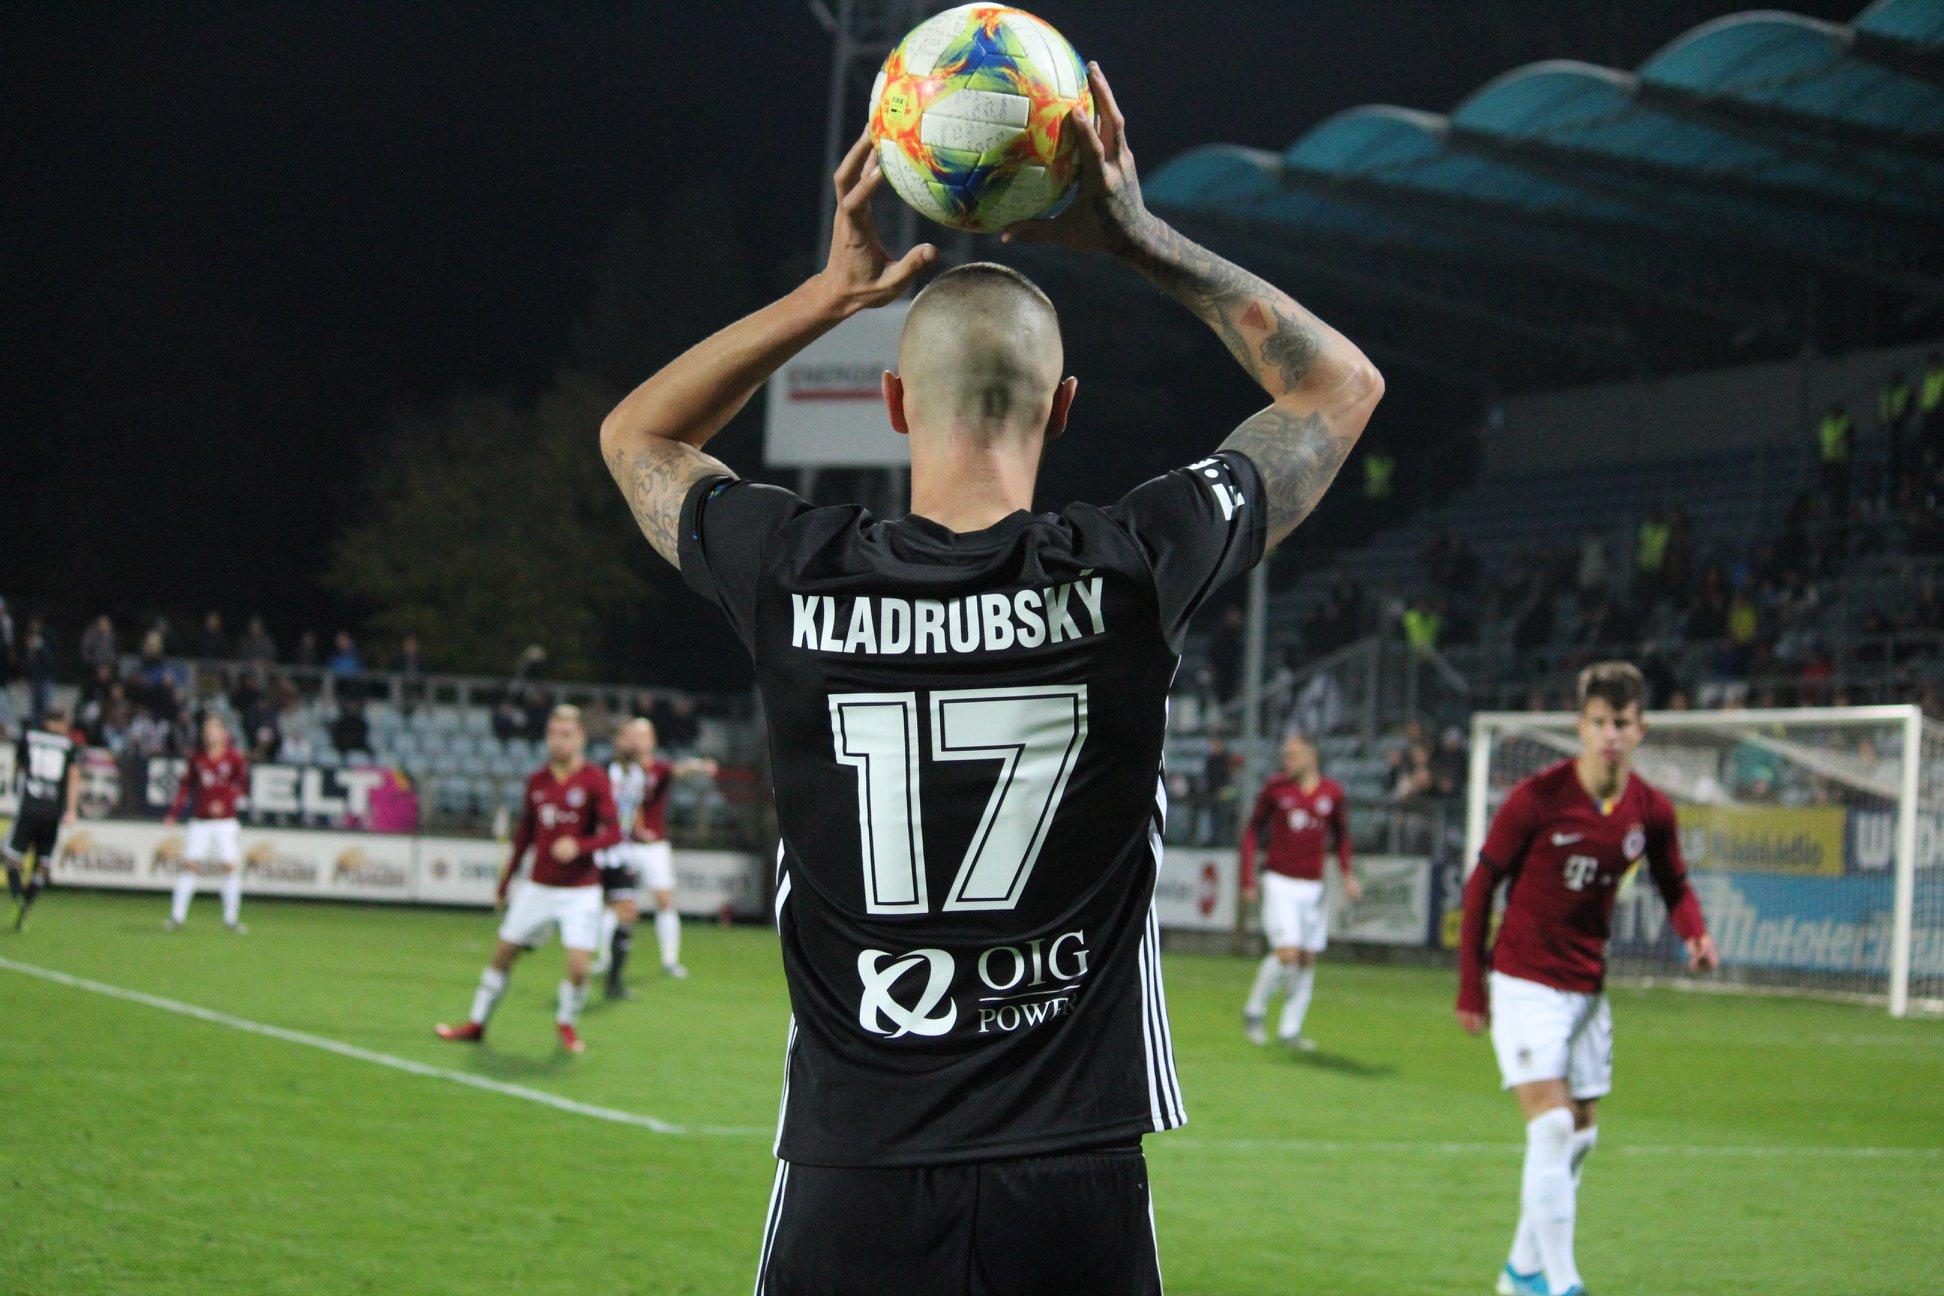 Fotbal Dynamo - Sparta, Jiří Kladrubský